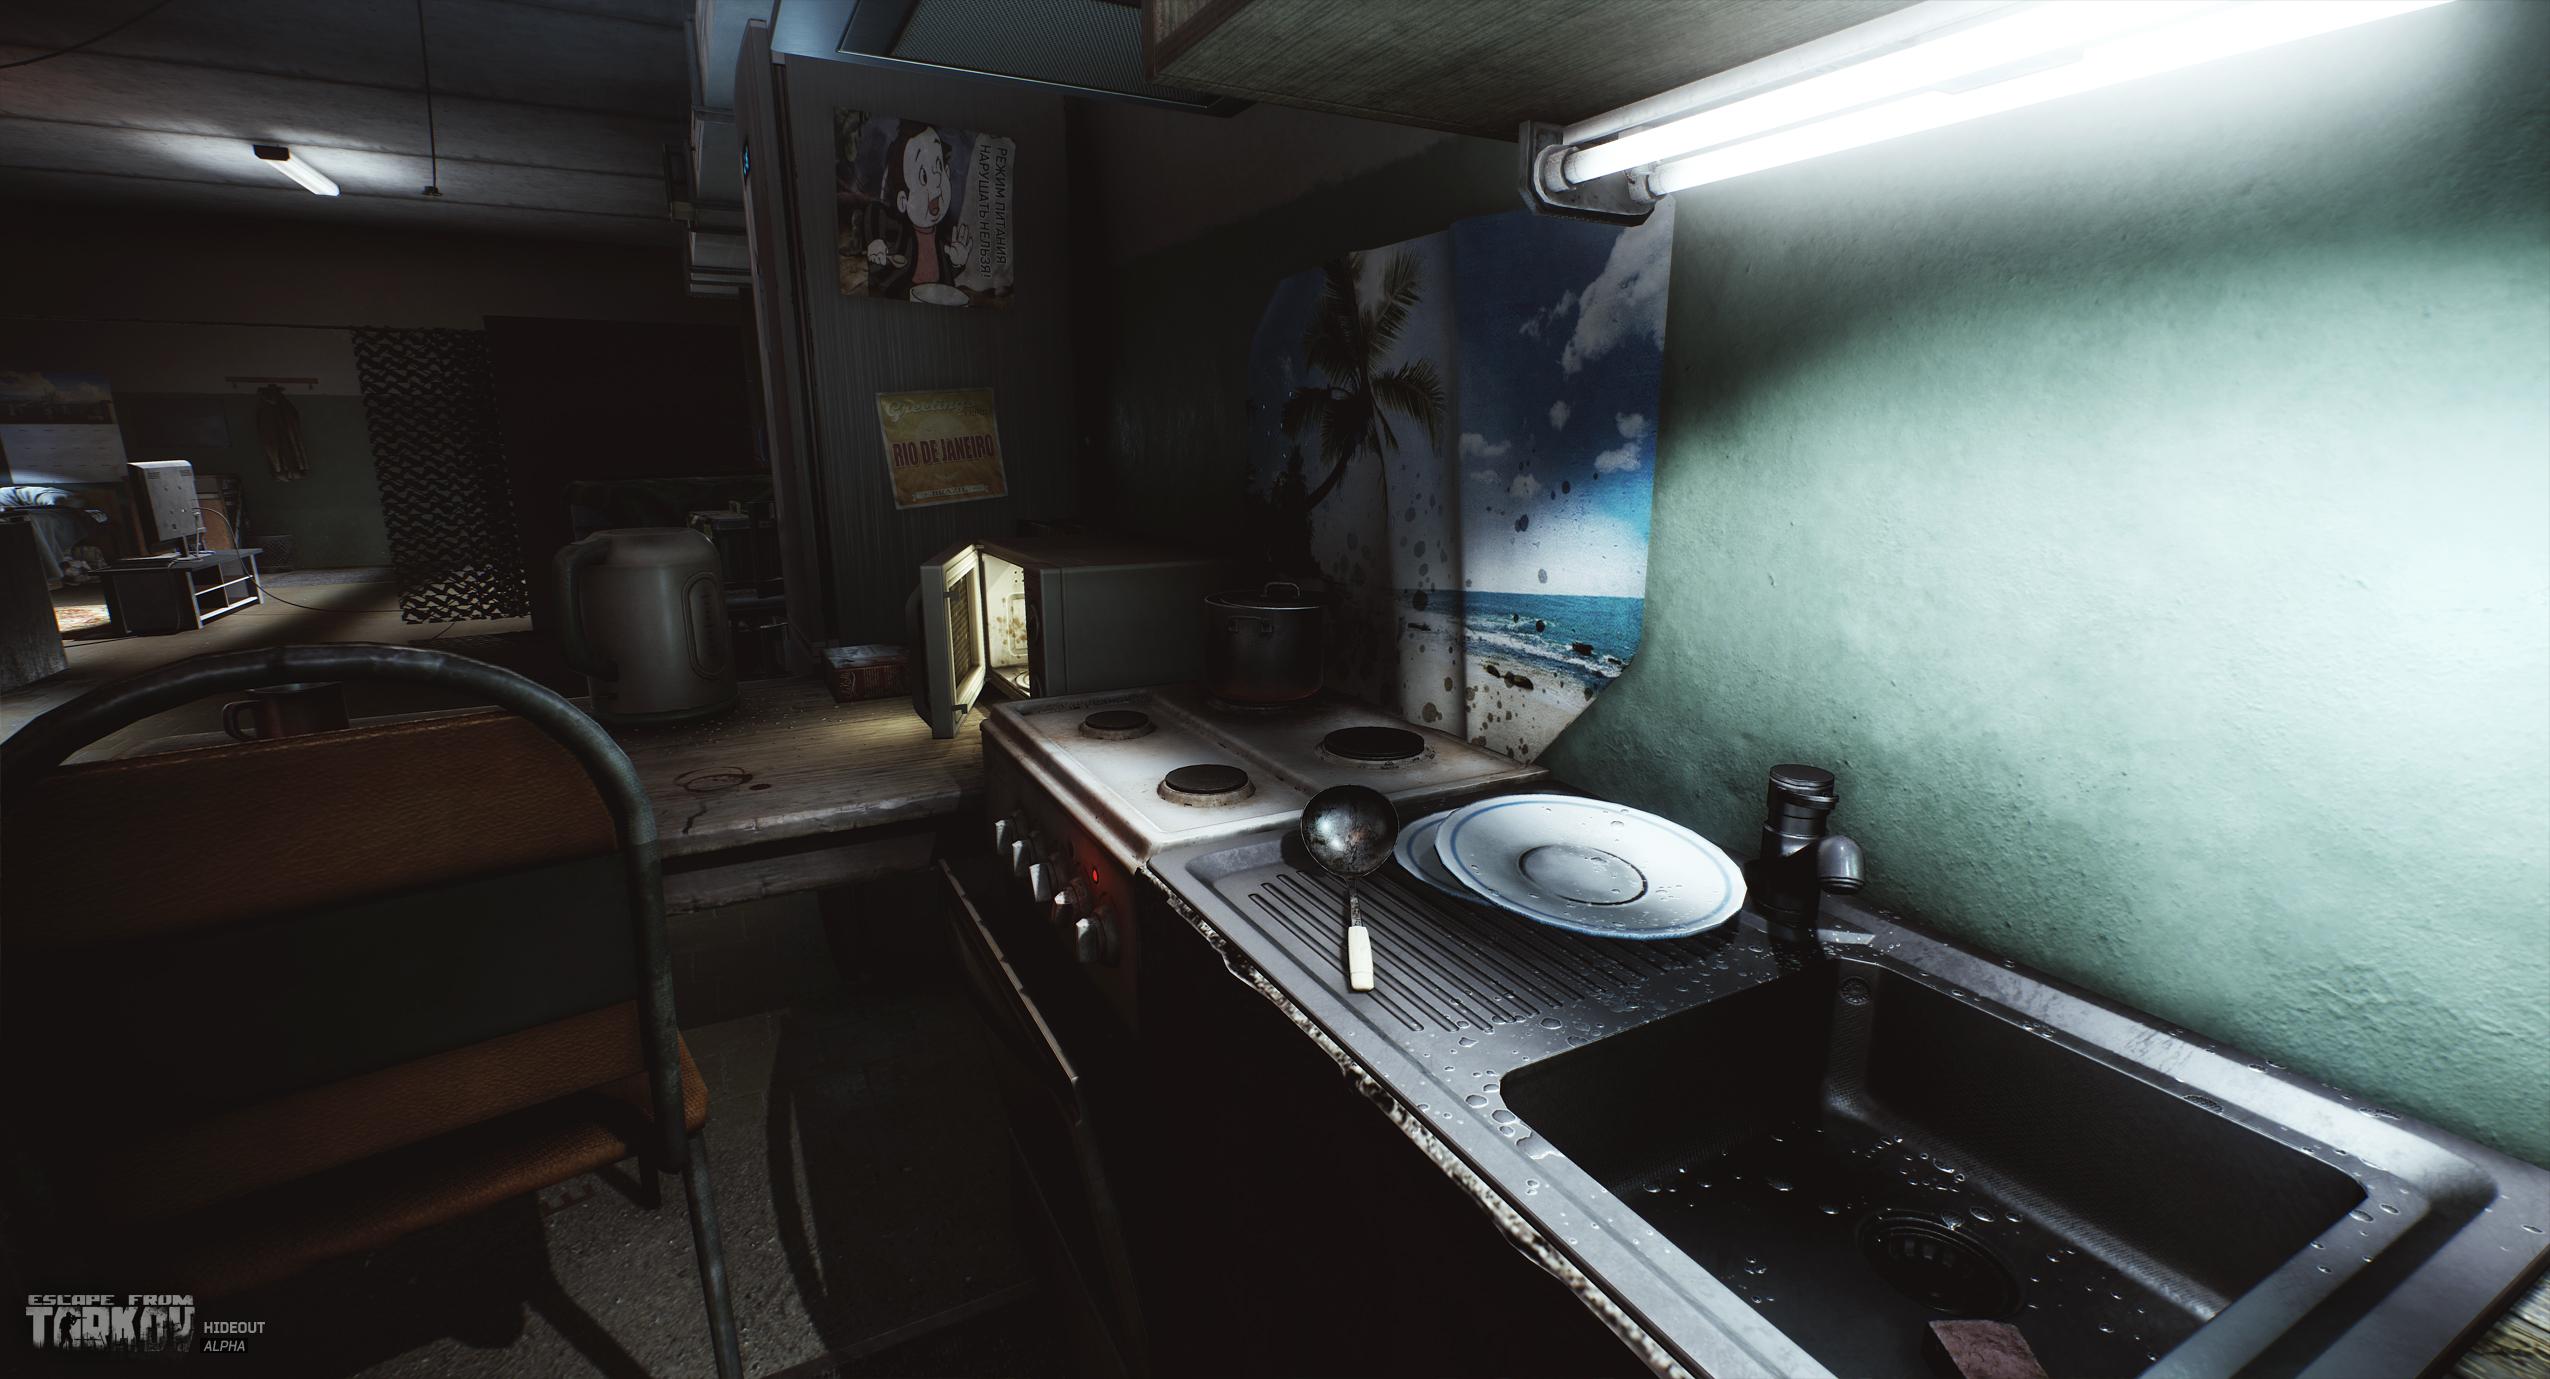 escapefromtarkov_hideout12.jpg